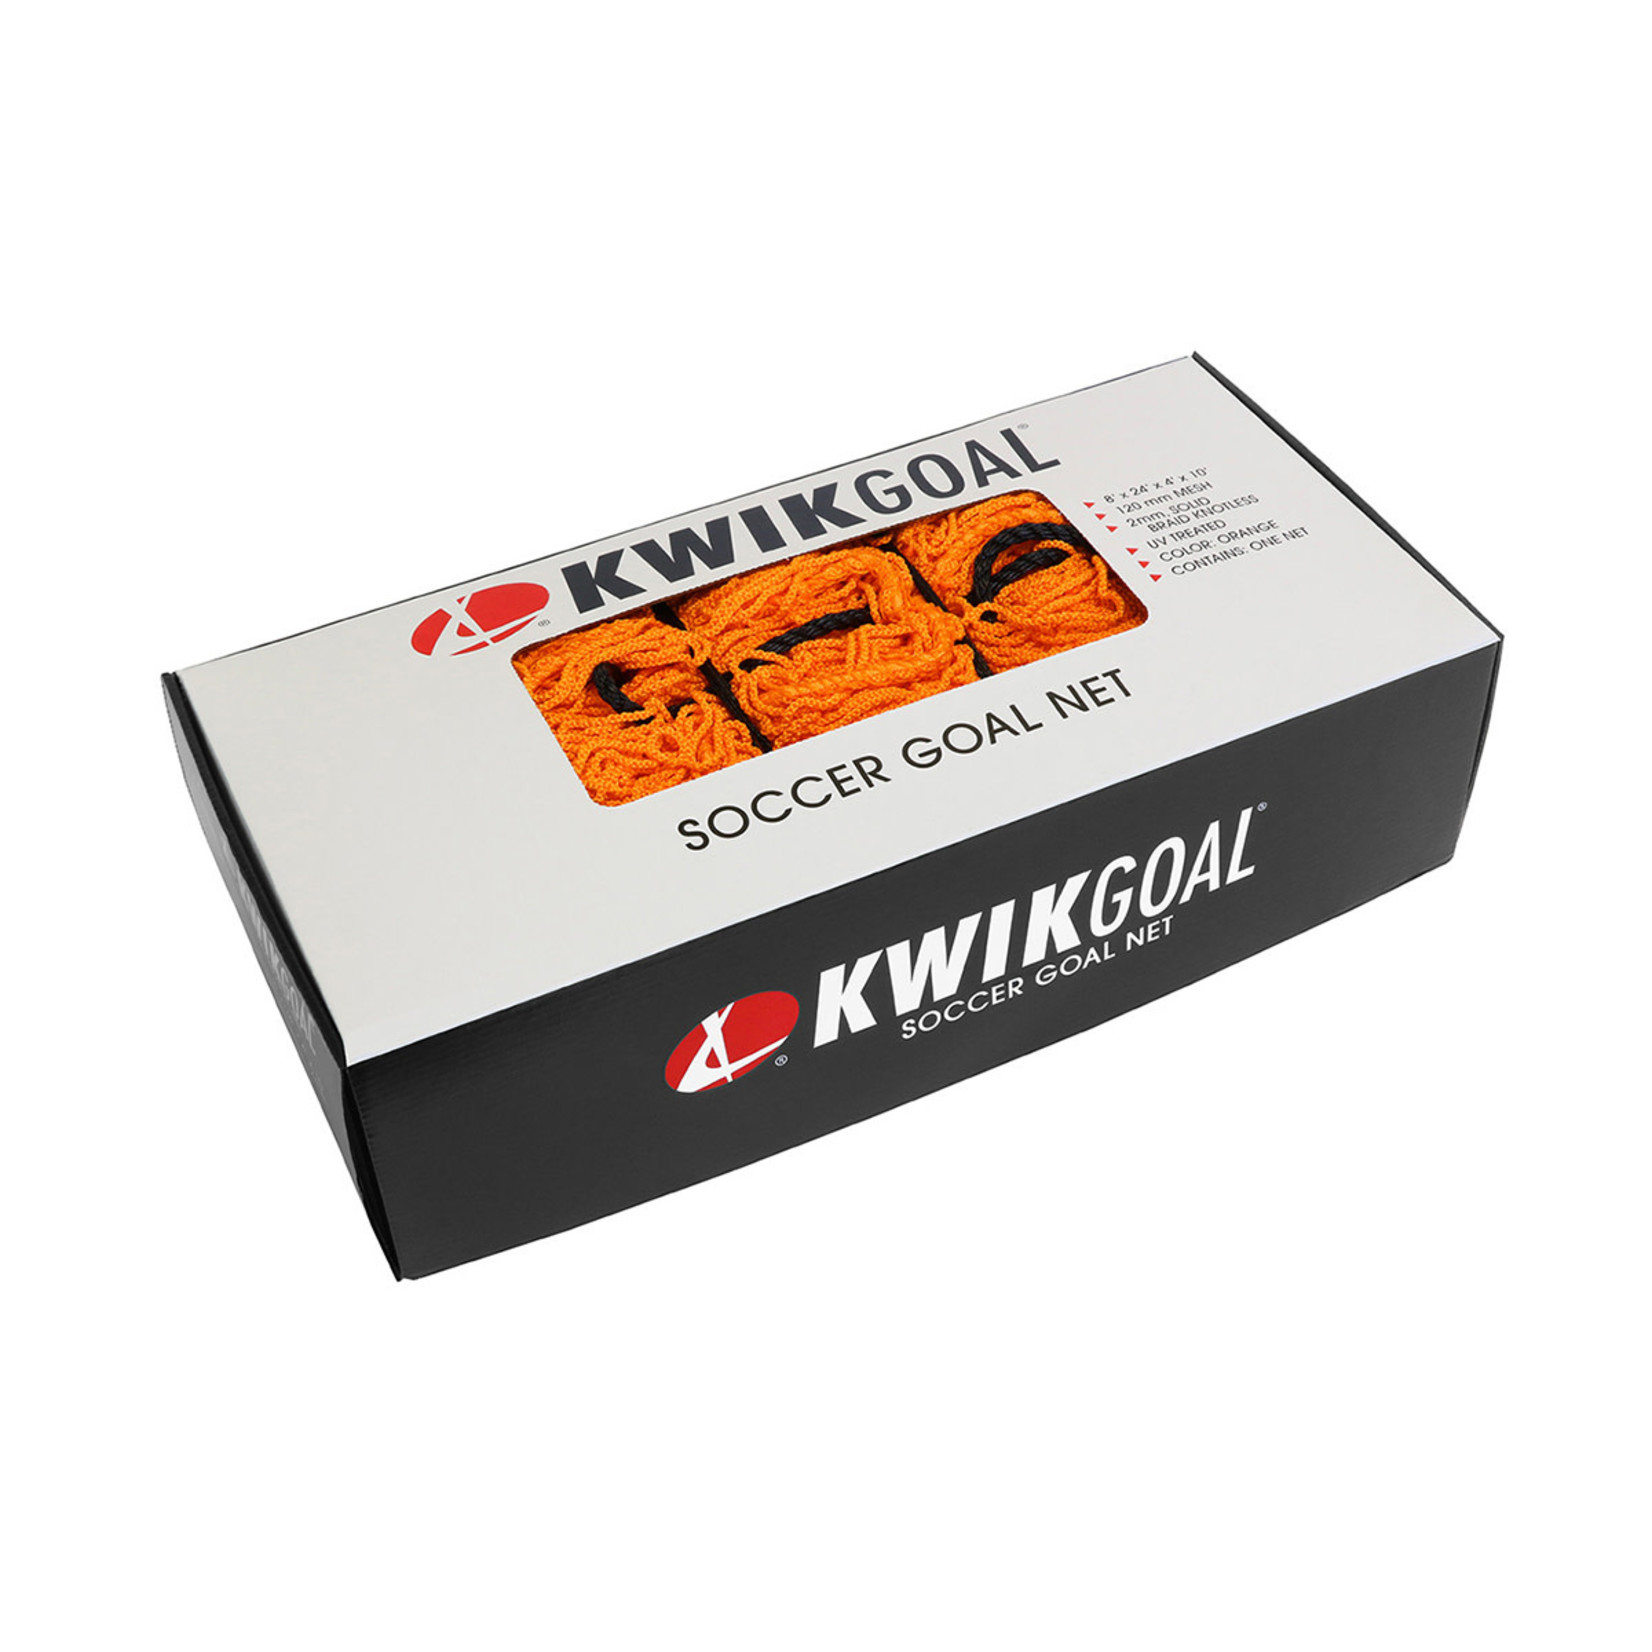 KWIK GOAL Recreational Soccer Net - 8H x 24W x 4D x 10B, 120mm mesh, Solid Braid Knotless